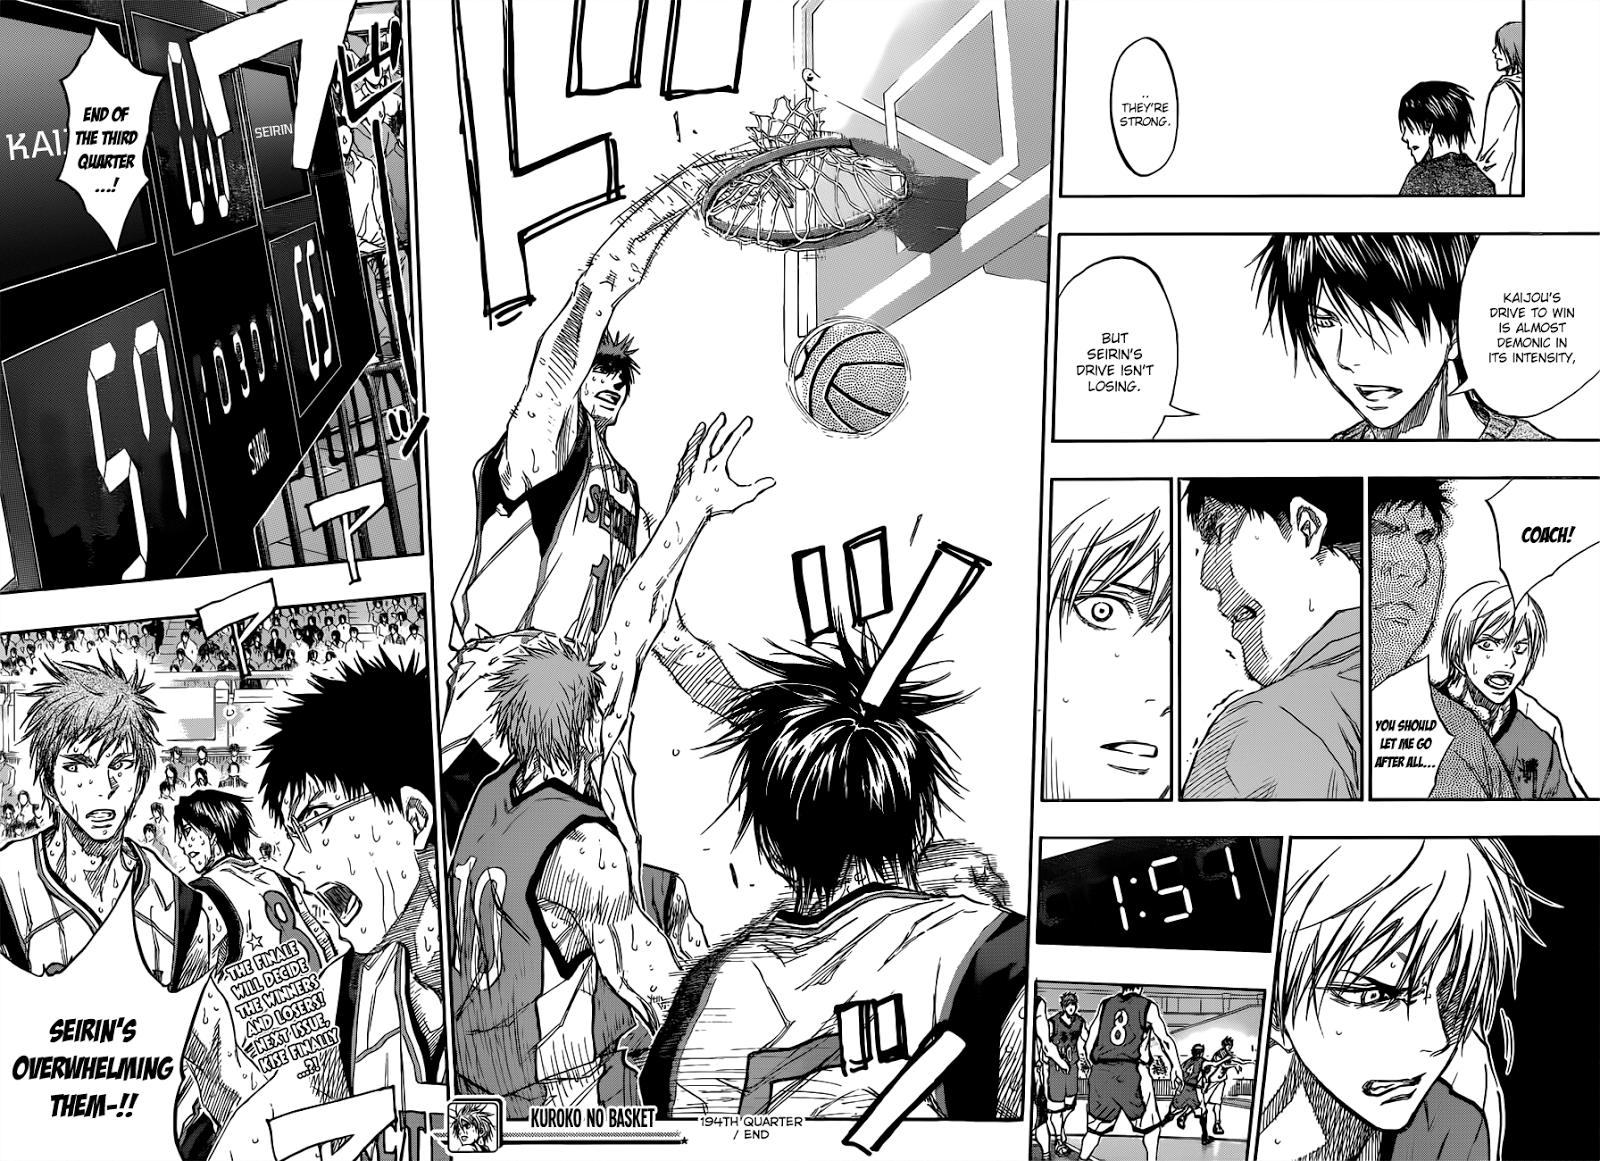 Kuroko no Basket Manga Chapter 194 - Image 18-19